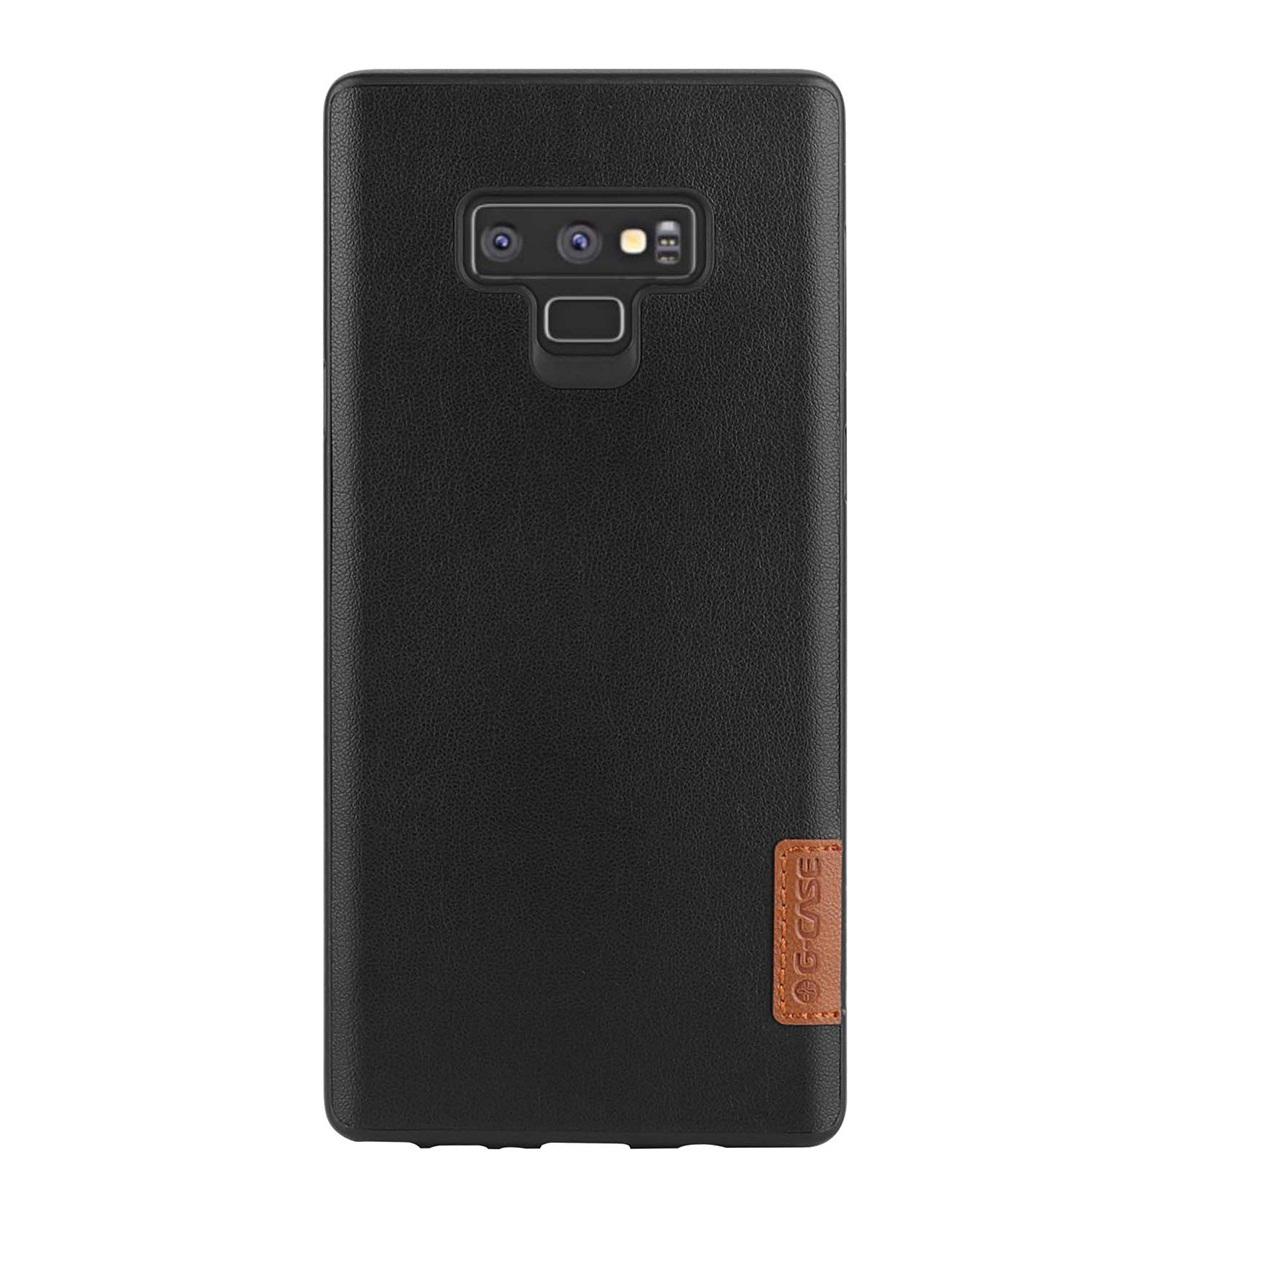 کاور جی-کیس مدل BLKSHEEP مناسب برای گوشی موبایل سامسونگ Galaxy Note 9